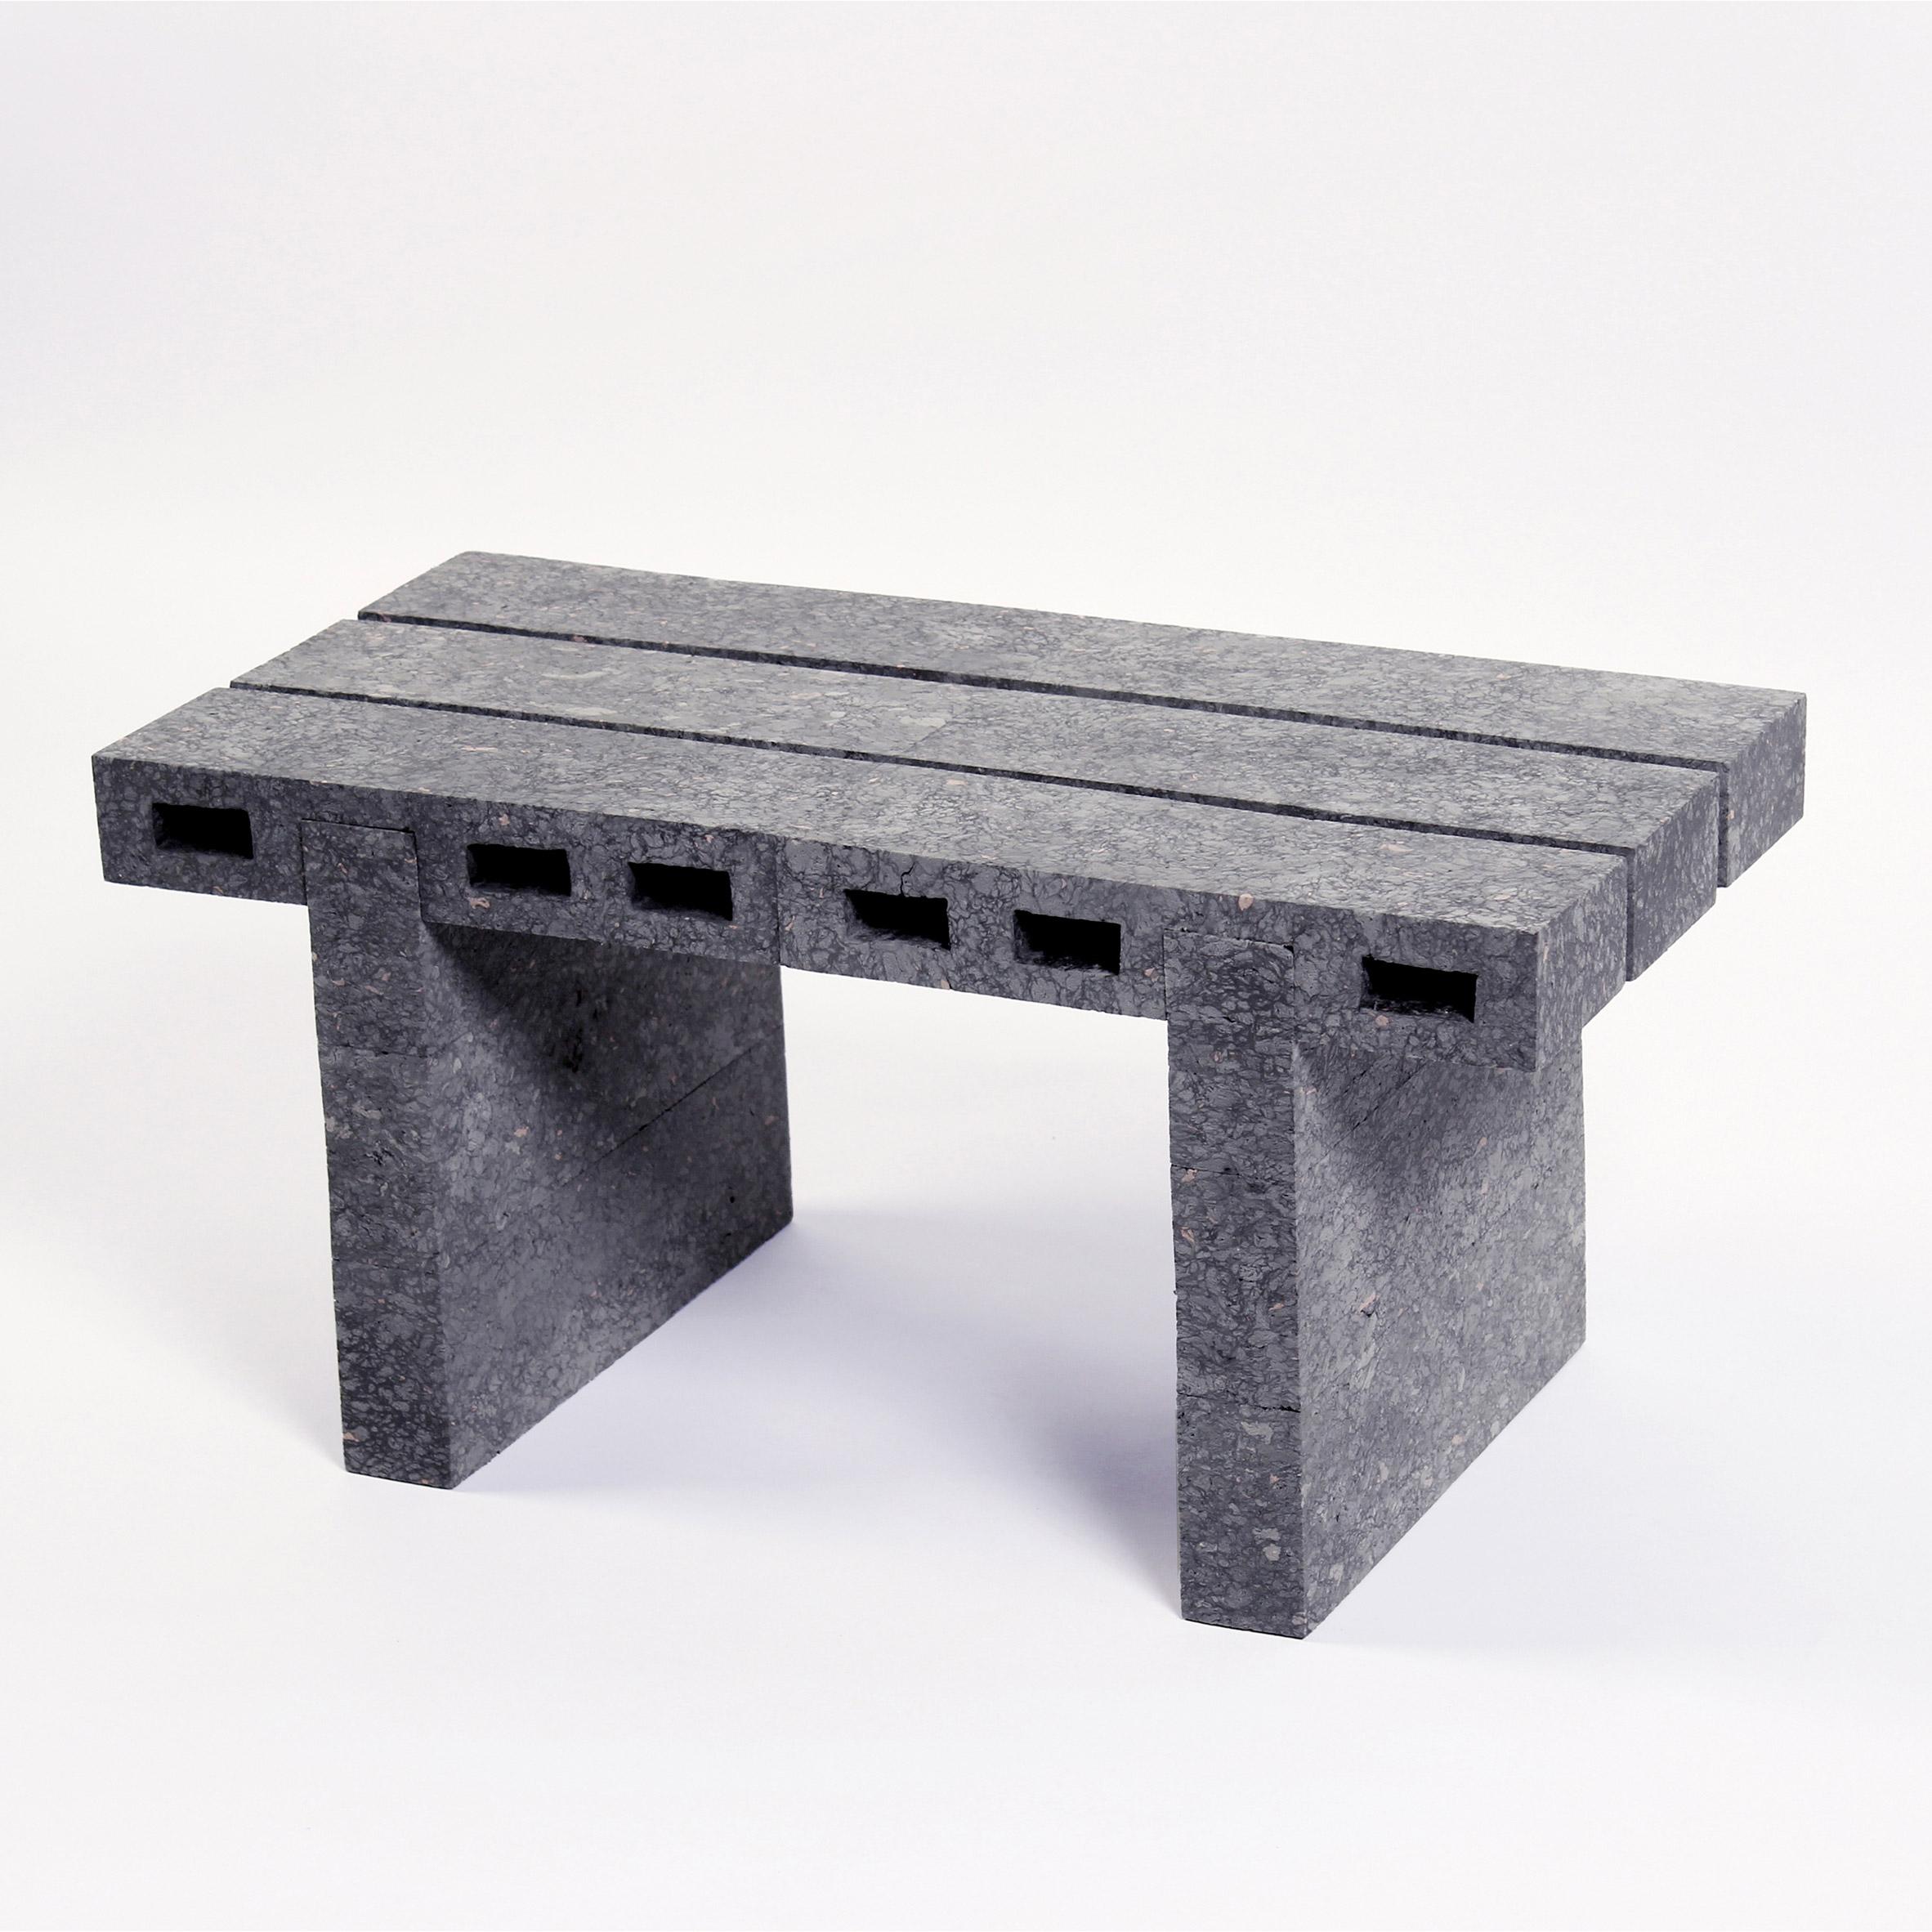 paper-bricks-woo-jai-lee-furniture-sustainable-design-furniture-dutch-design-week_dezeen_2364_col_2